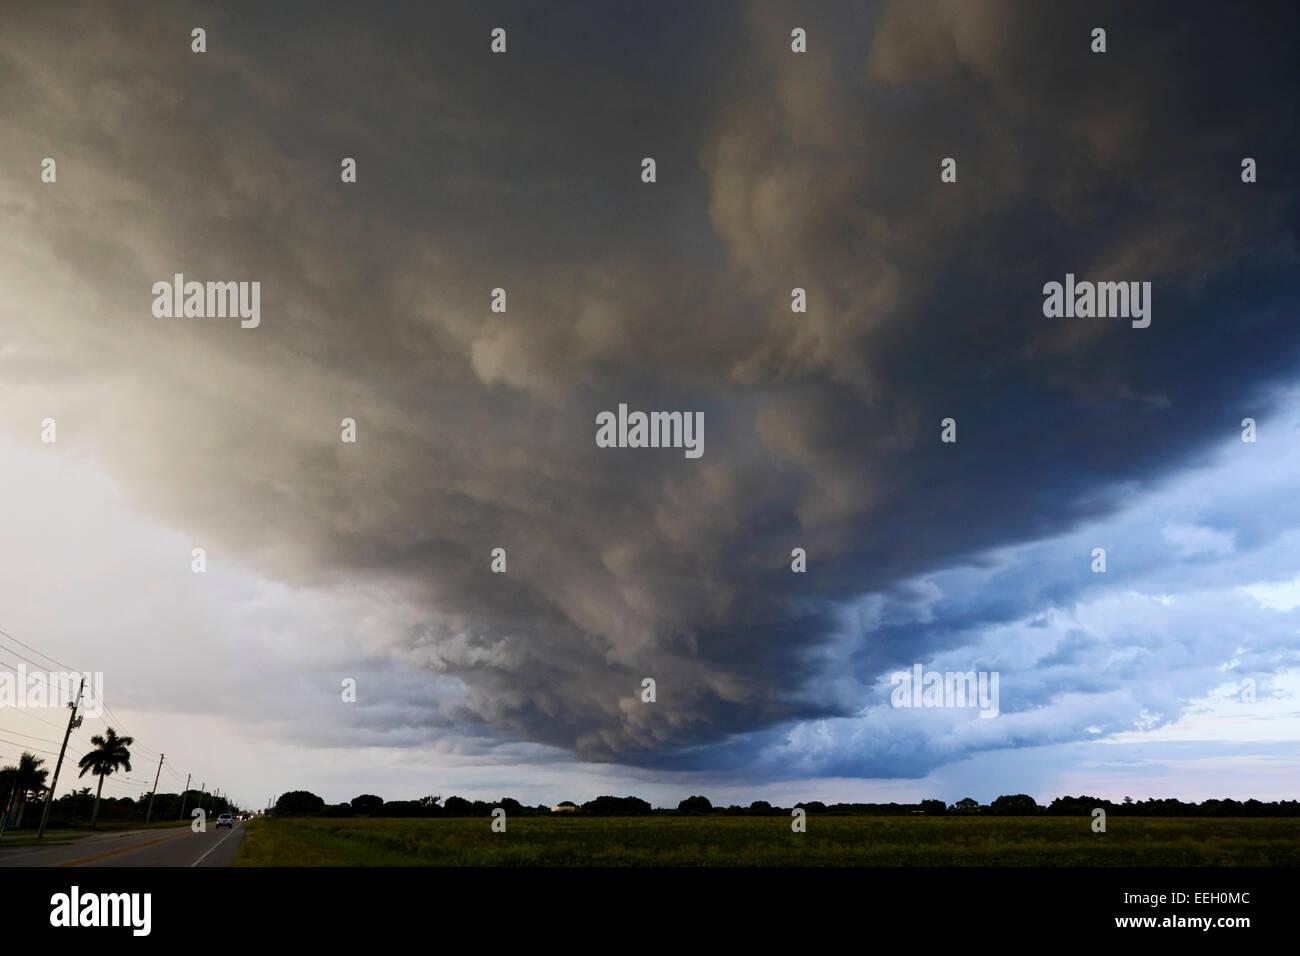 arcus cloud shelf cloud formation preceding a thunderstorm on farmland near the florida everglades usa - Stock Image